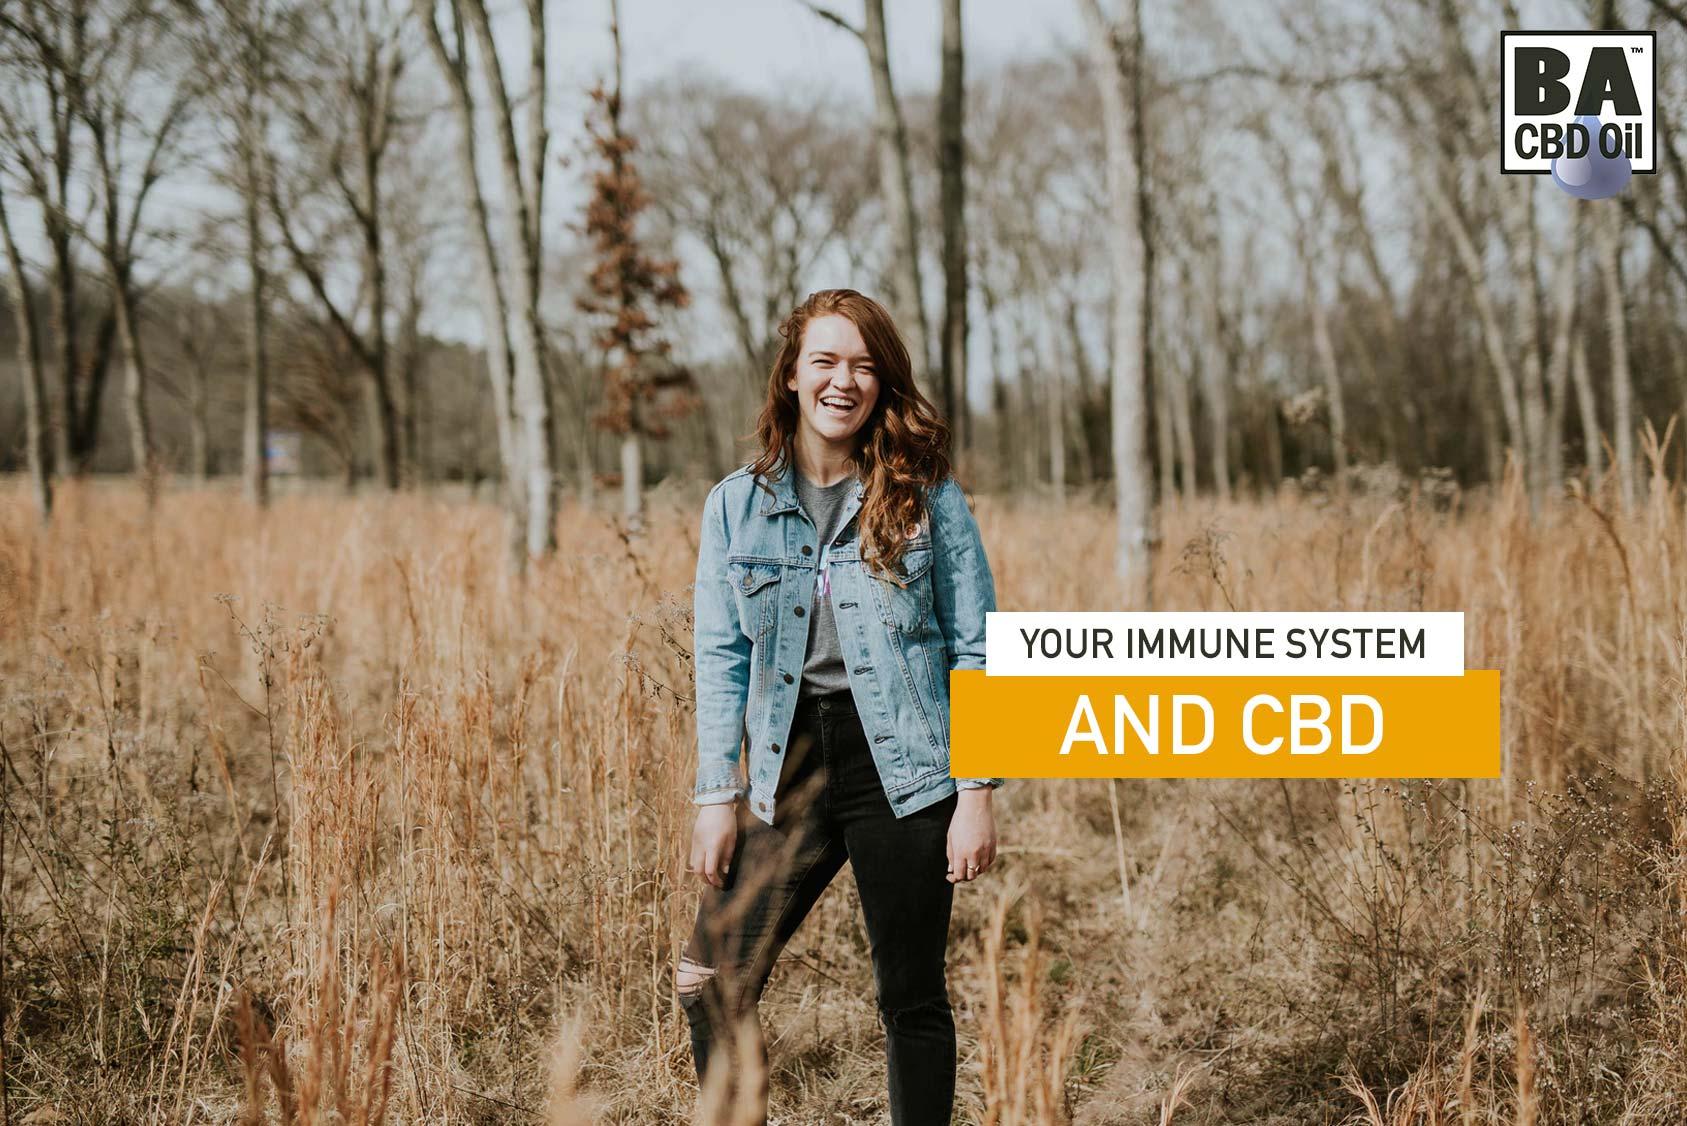 Immune System And CBD